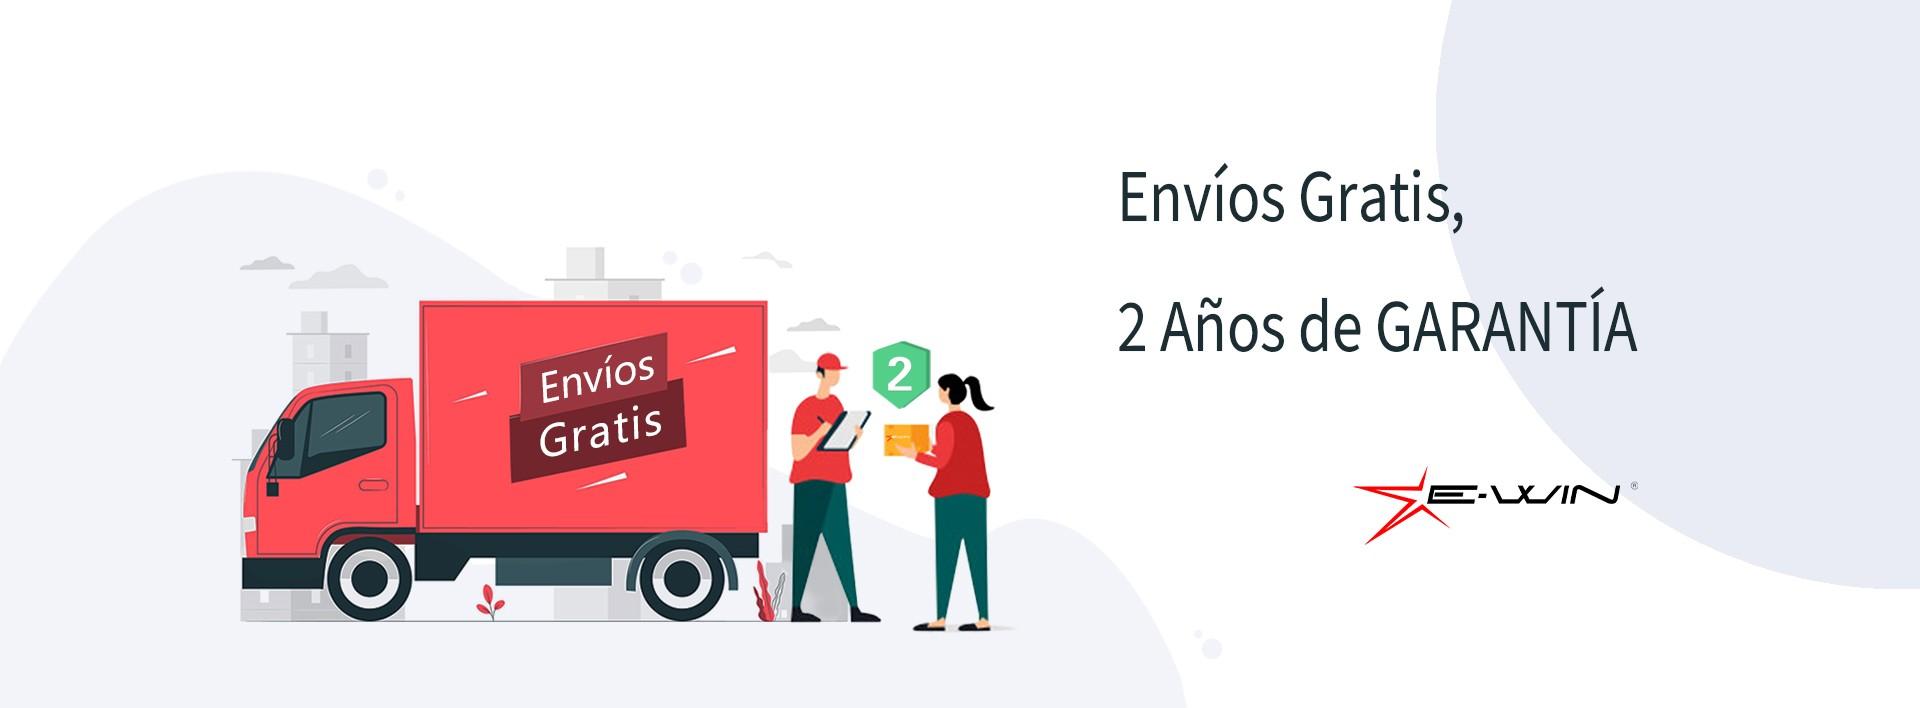 https://www.ewin.com.mx/contenido/18-nuestra-garantia